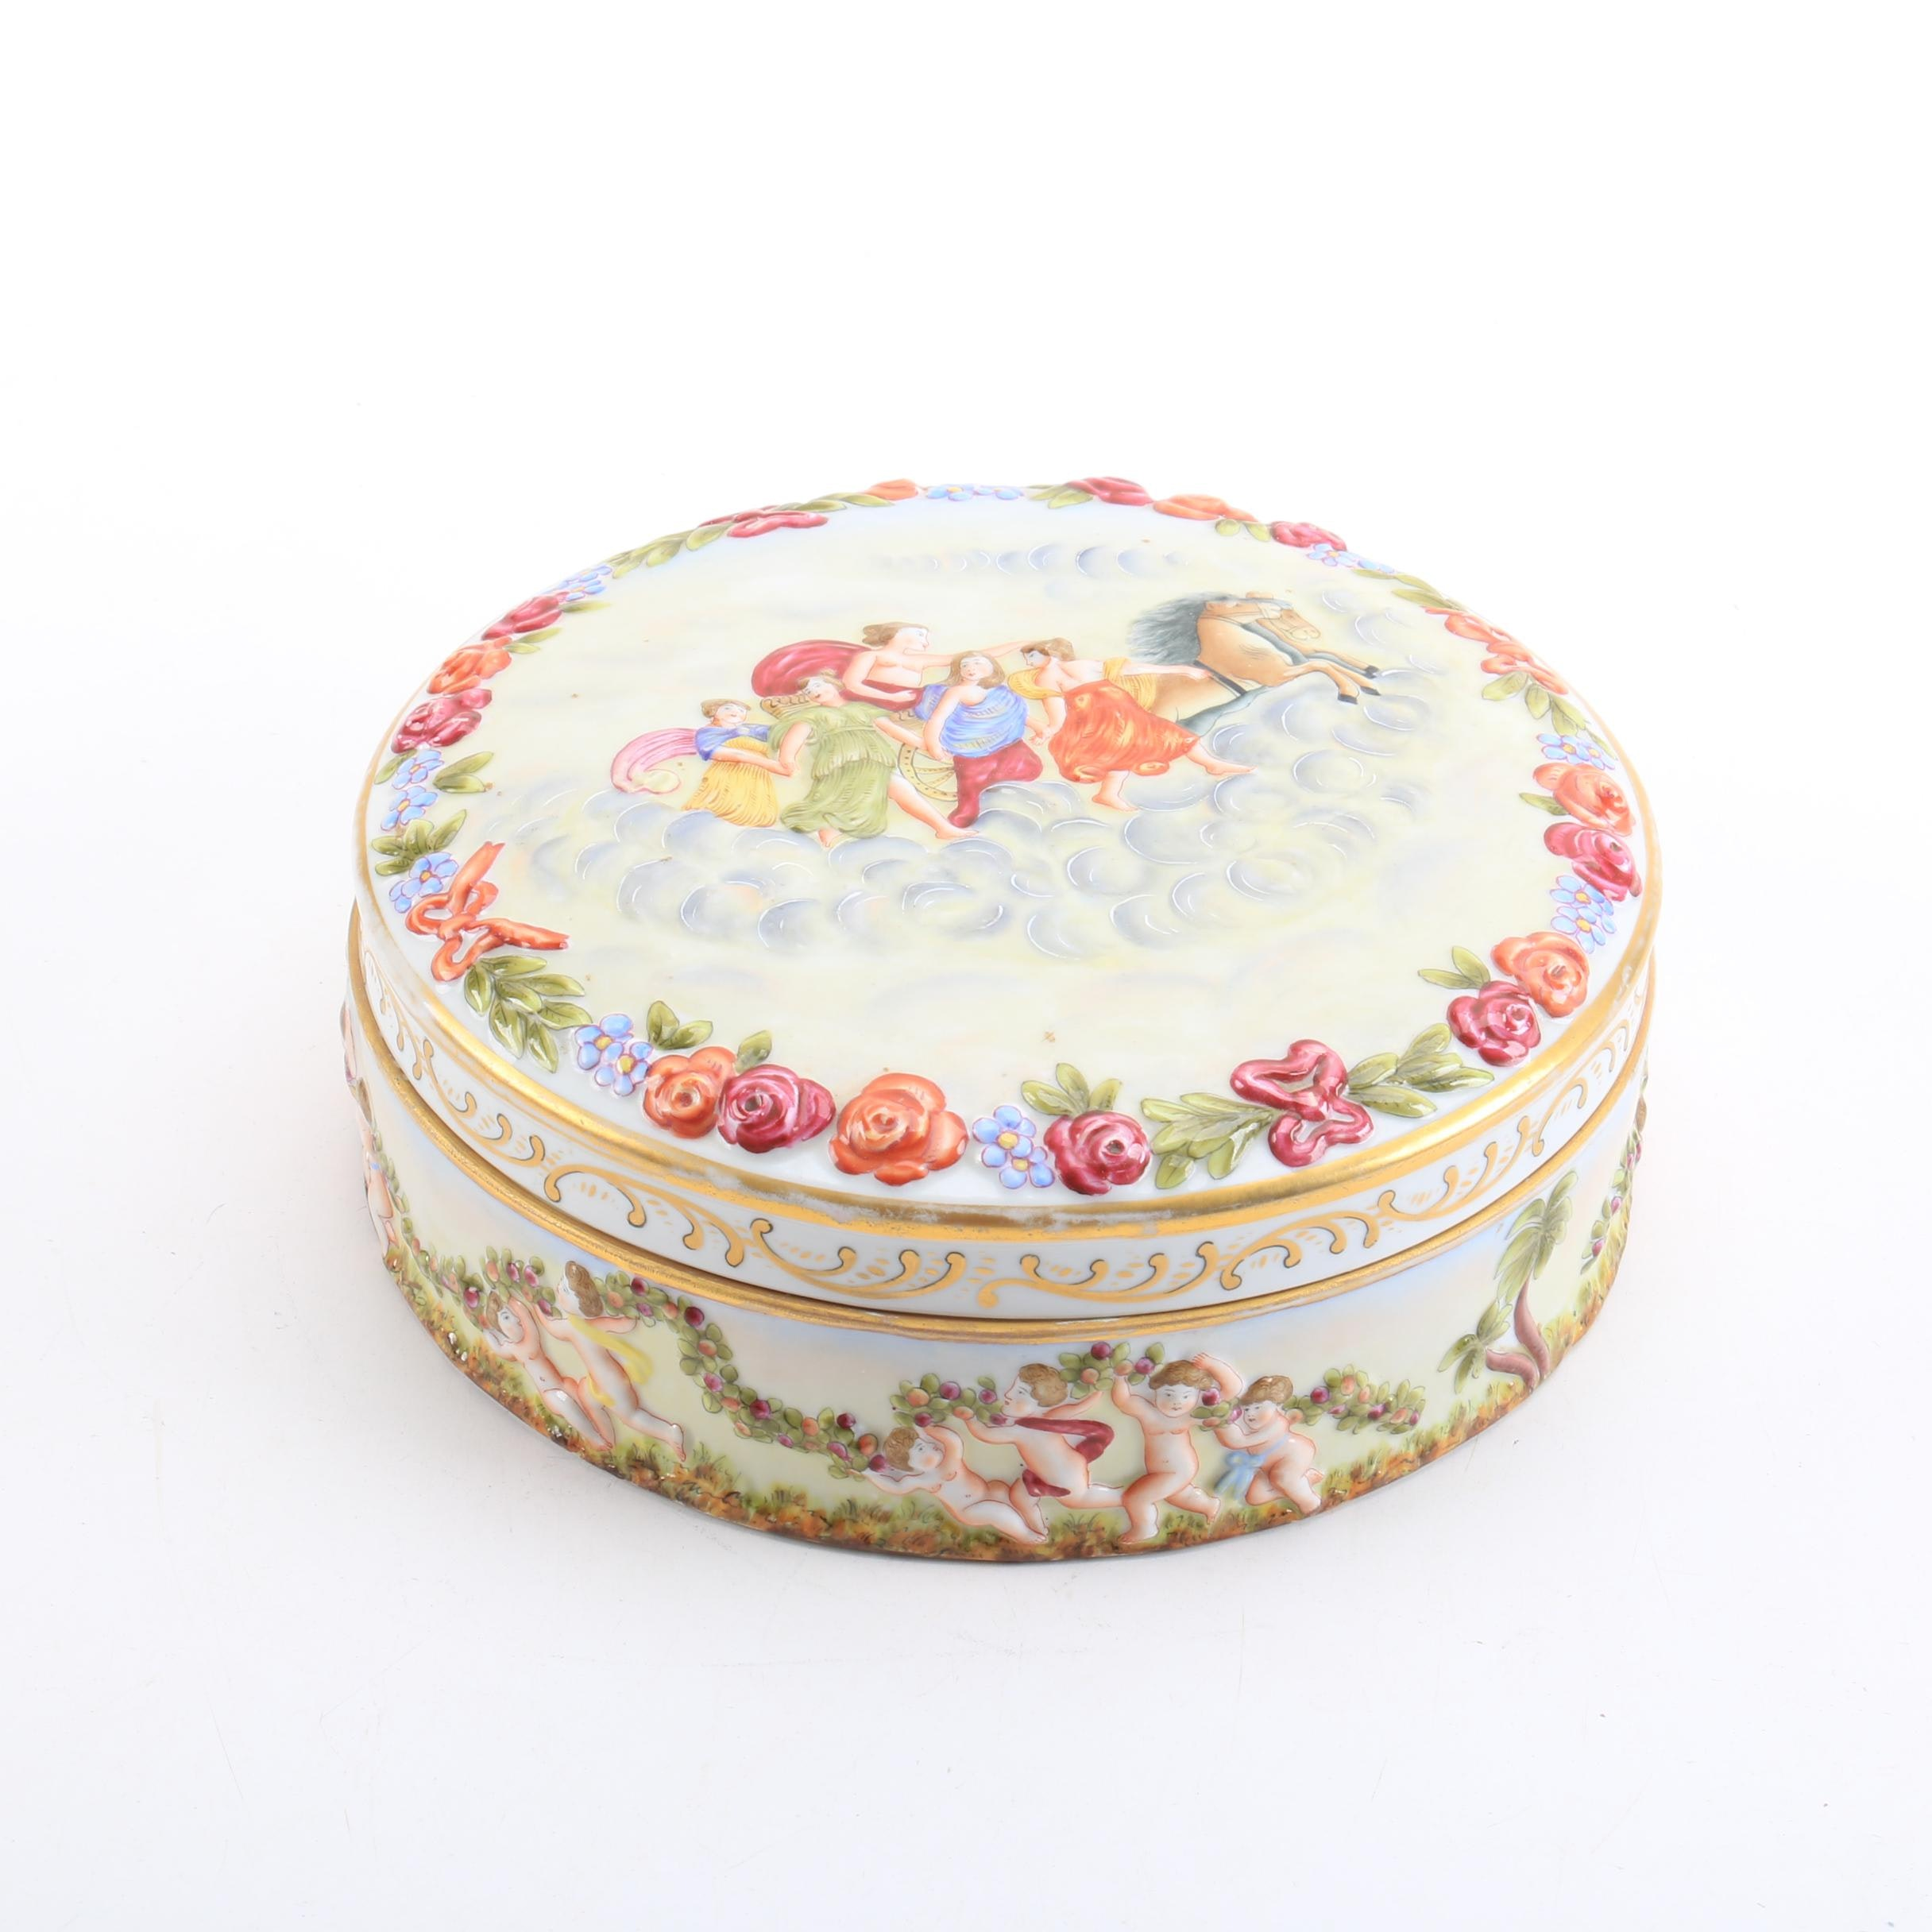 Capodimonte Lidded Ceramic Trinket Dish